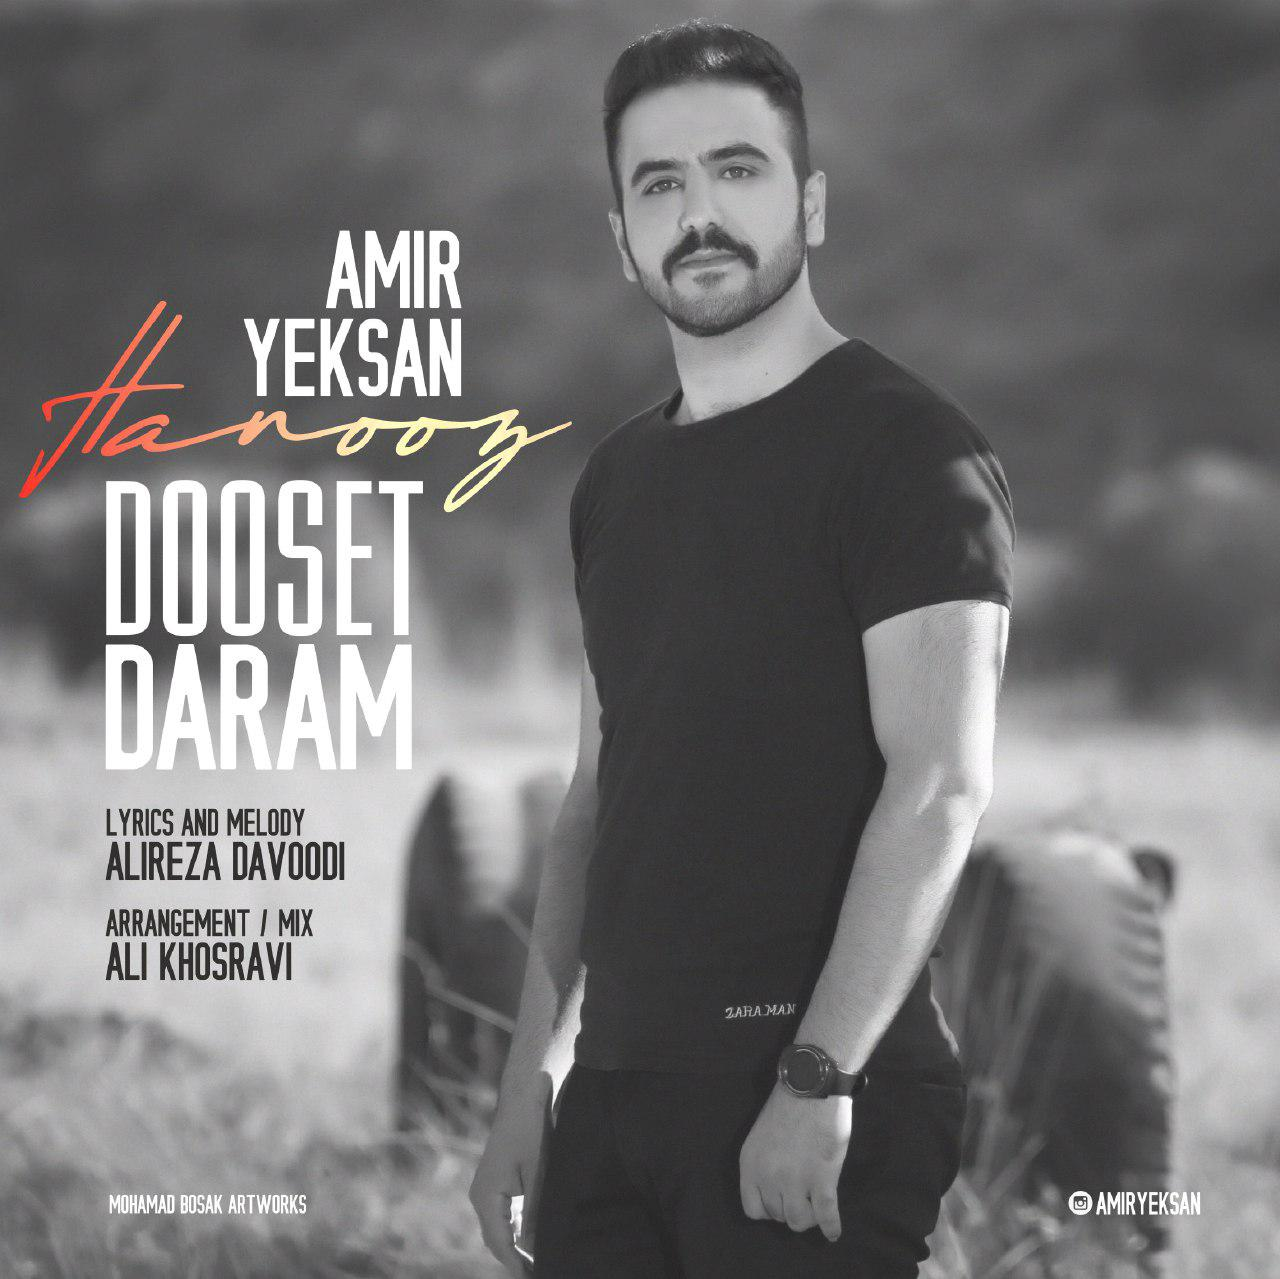 Amir Yeksan – Hanooz Dooset Daram